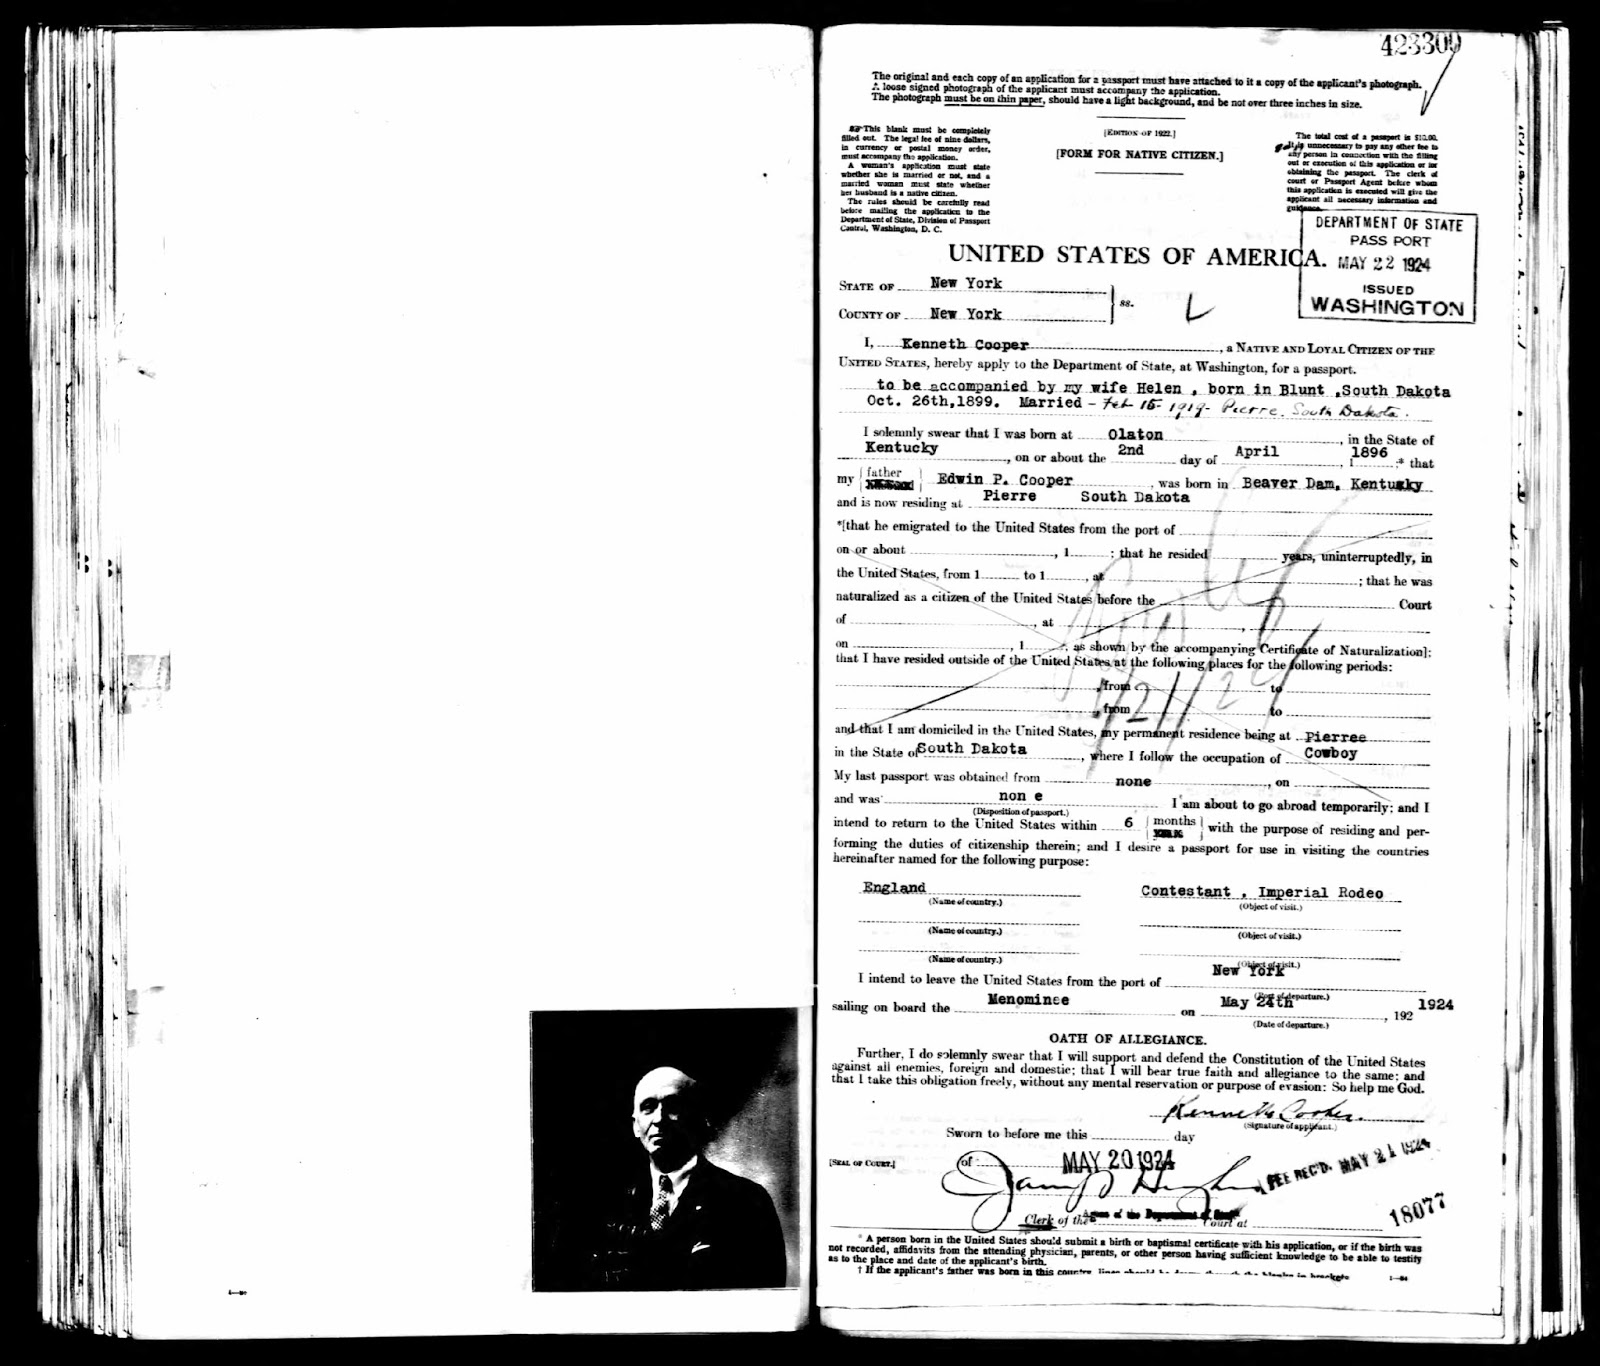 Fresh photos of birth certificate norwalk business cards and birth certificate norwalk ohio best design sertificate 2017 aiddatafo Gallery